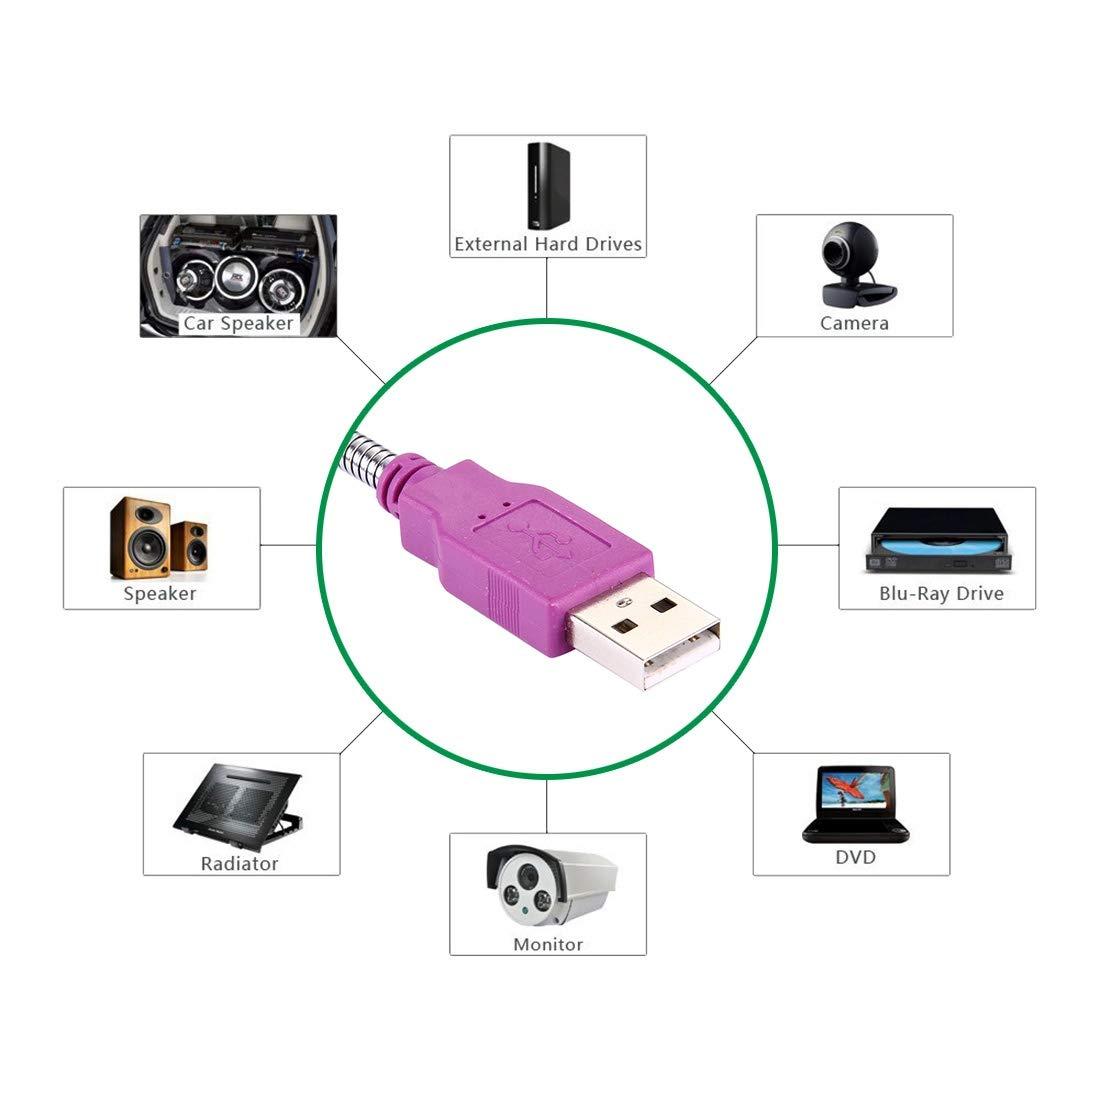 Purple Computer Cables /& Connectors 10cm USB 2.0 Female to USB 2.0 Male Metal Soft Hose Adapter Cable USB Cable Color : Purple